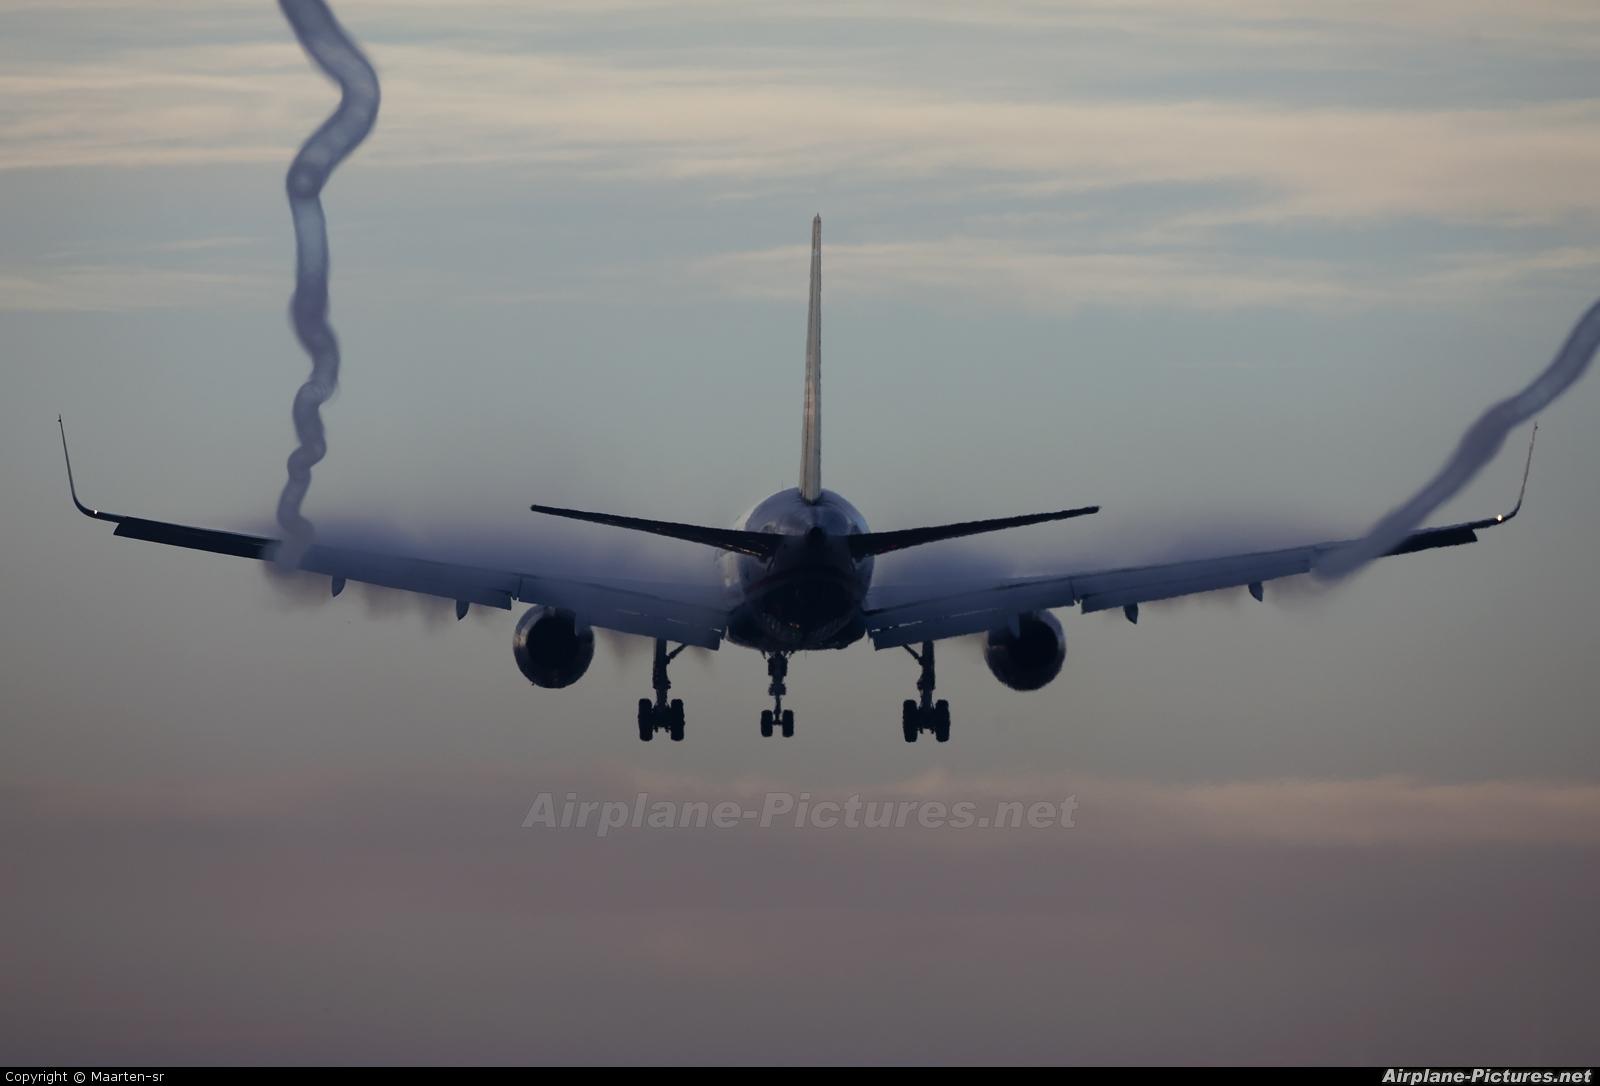 US Airways - aircraft at Amsterdam - Schiphol